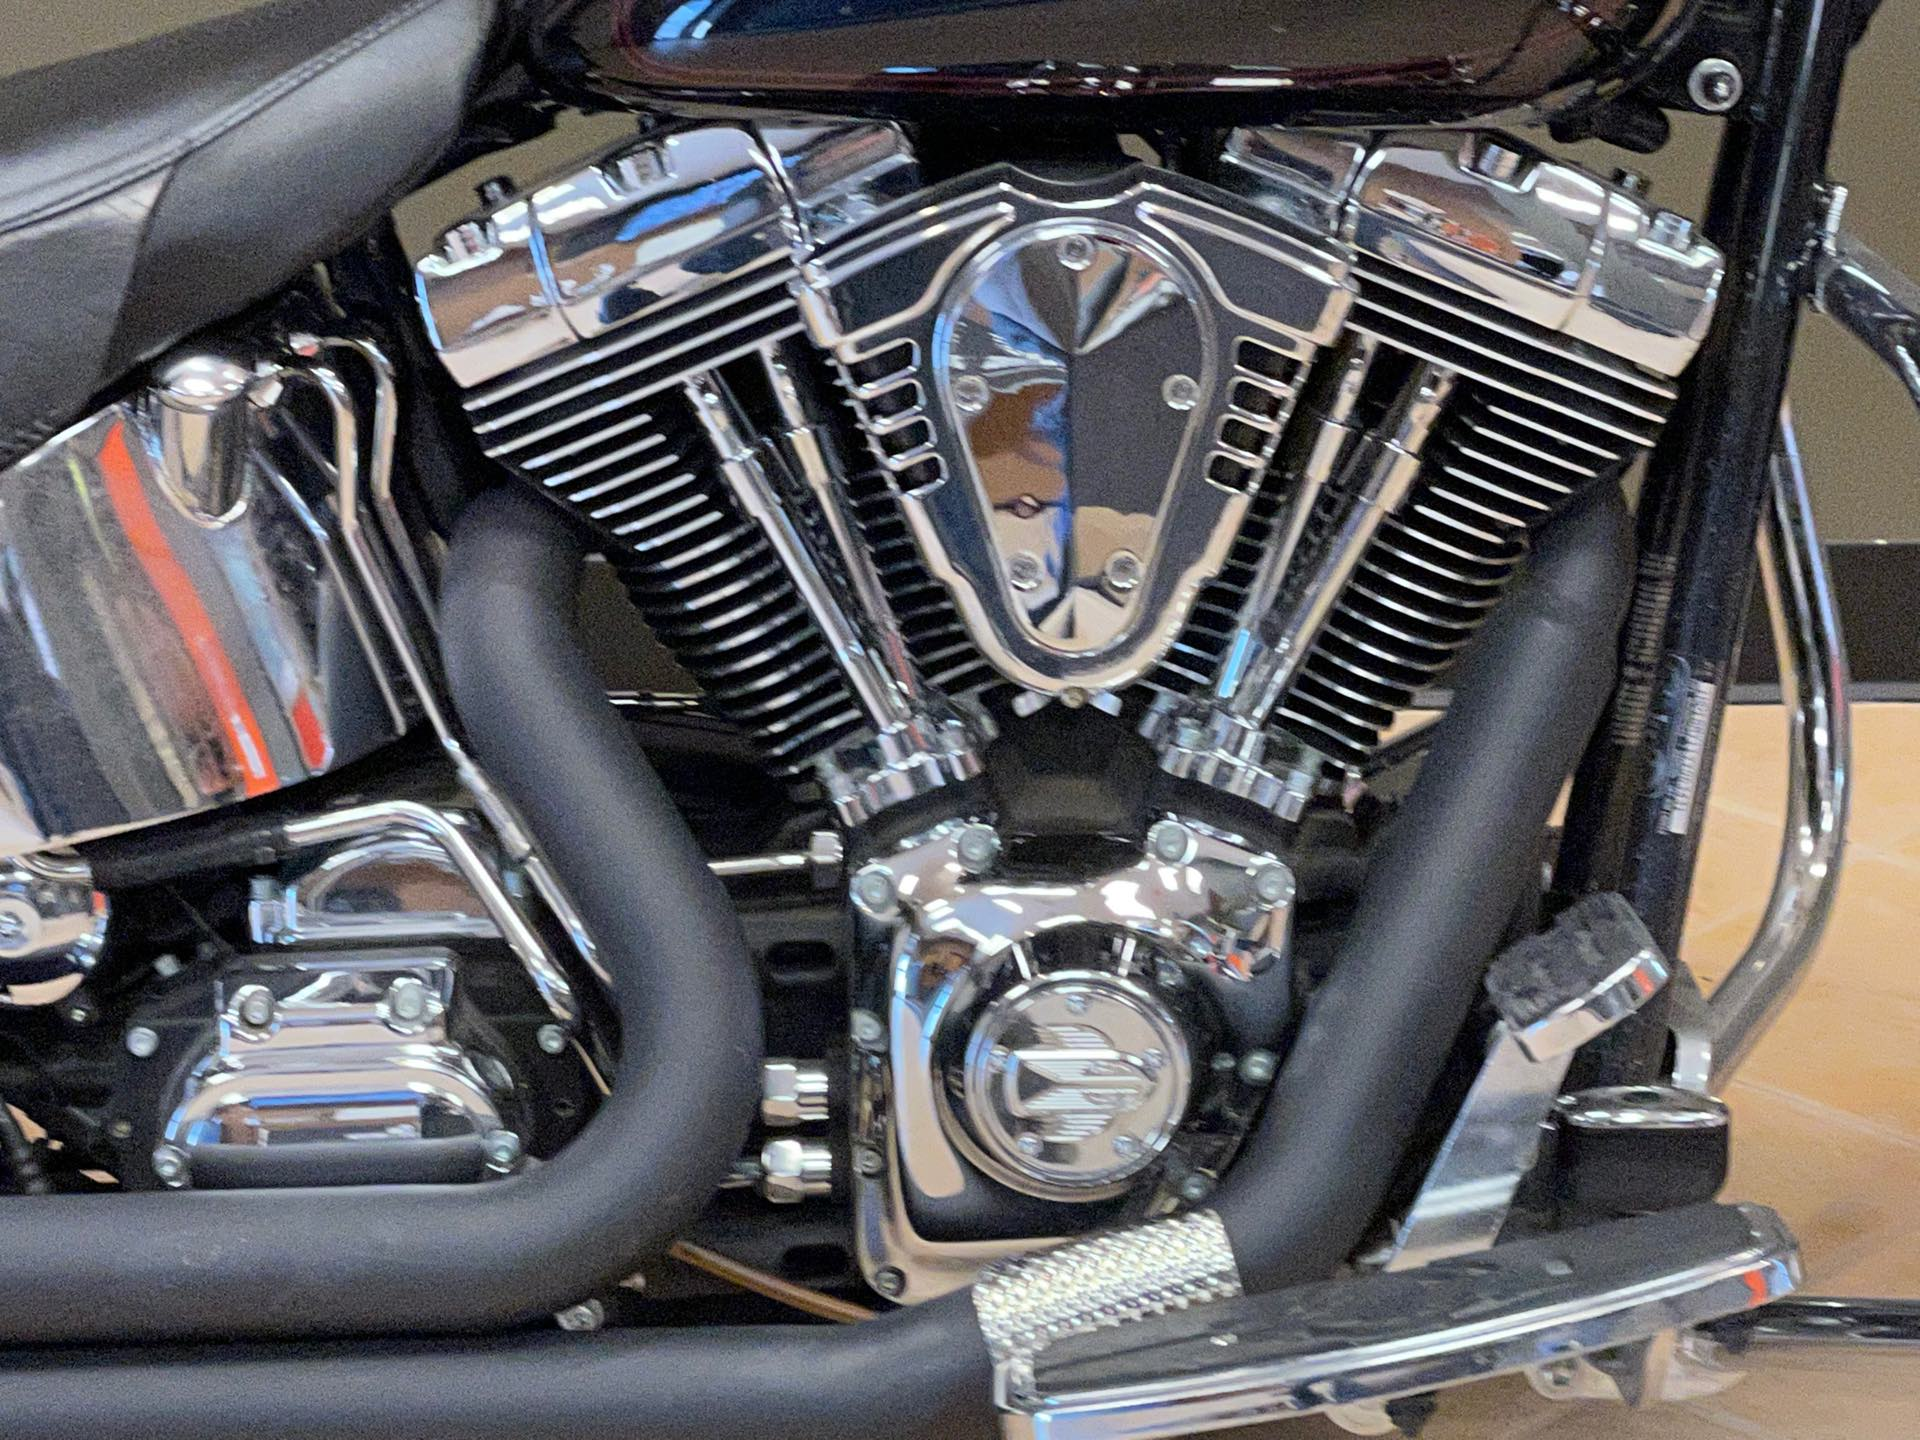 2000 HARLEY-DAVIDSON FLSTF at Loess Hills Harley-Davidson